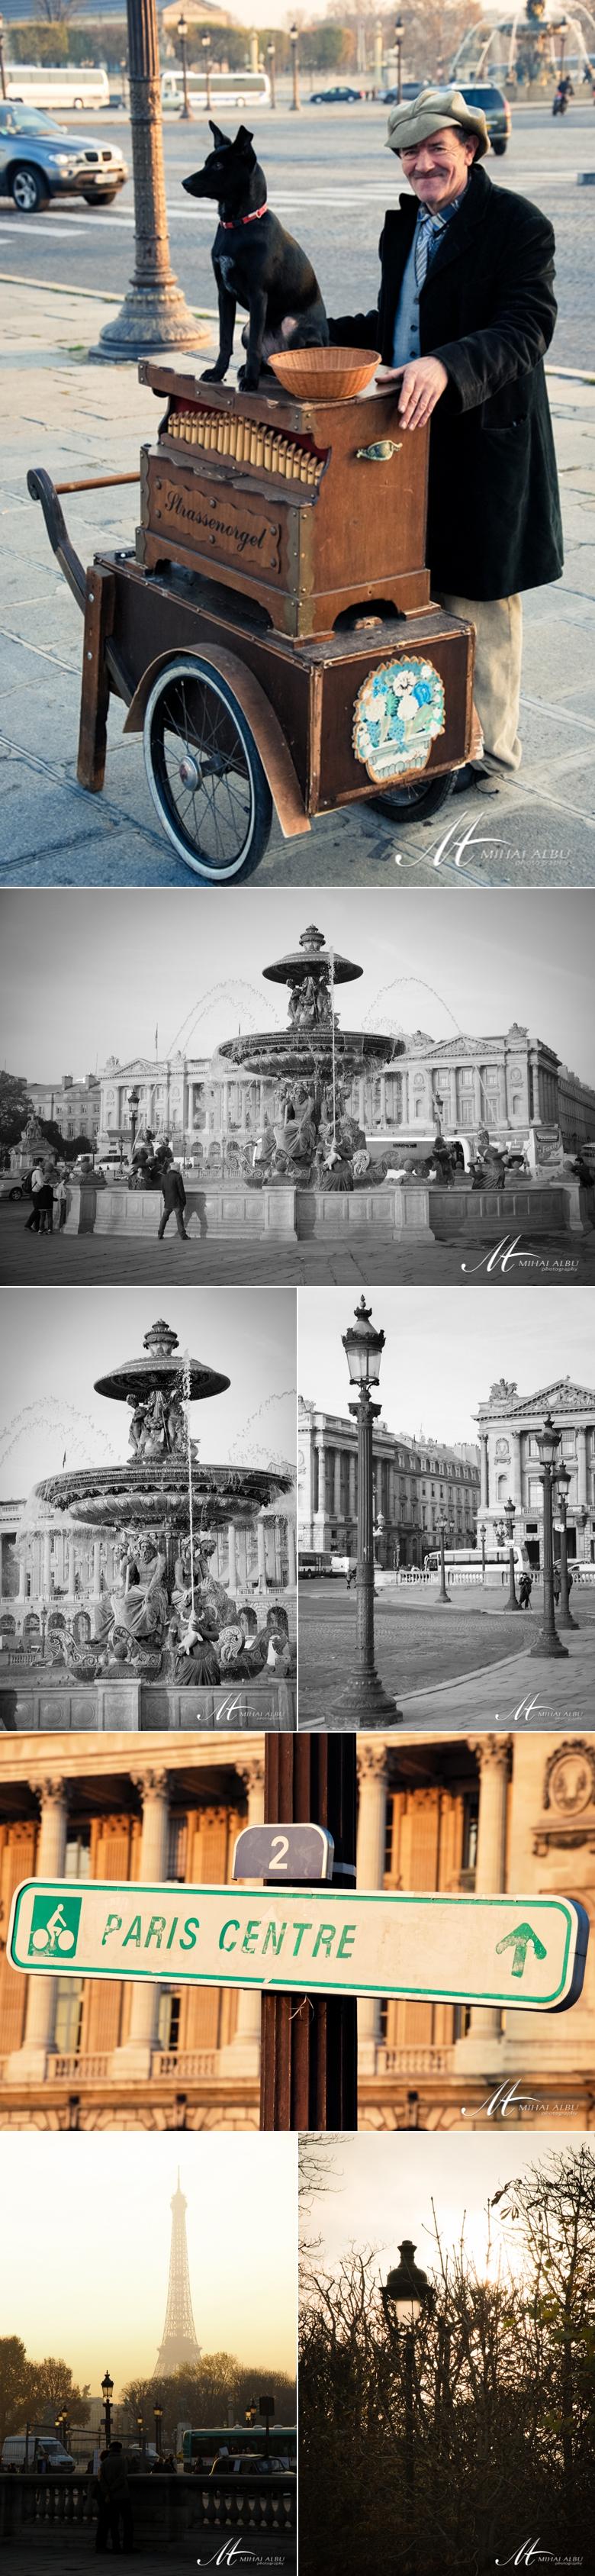 paris-poze-excursie-concediu-in-orasul-iubirii-turnul eiffel-muzeul-luvru 4